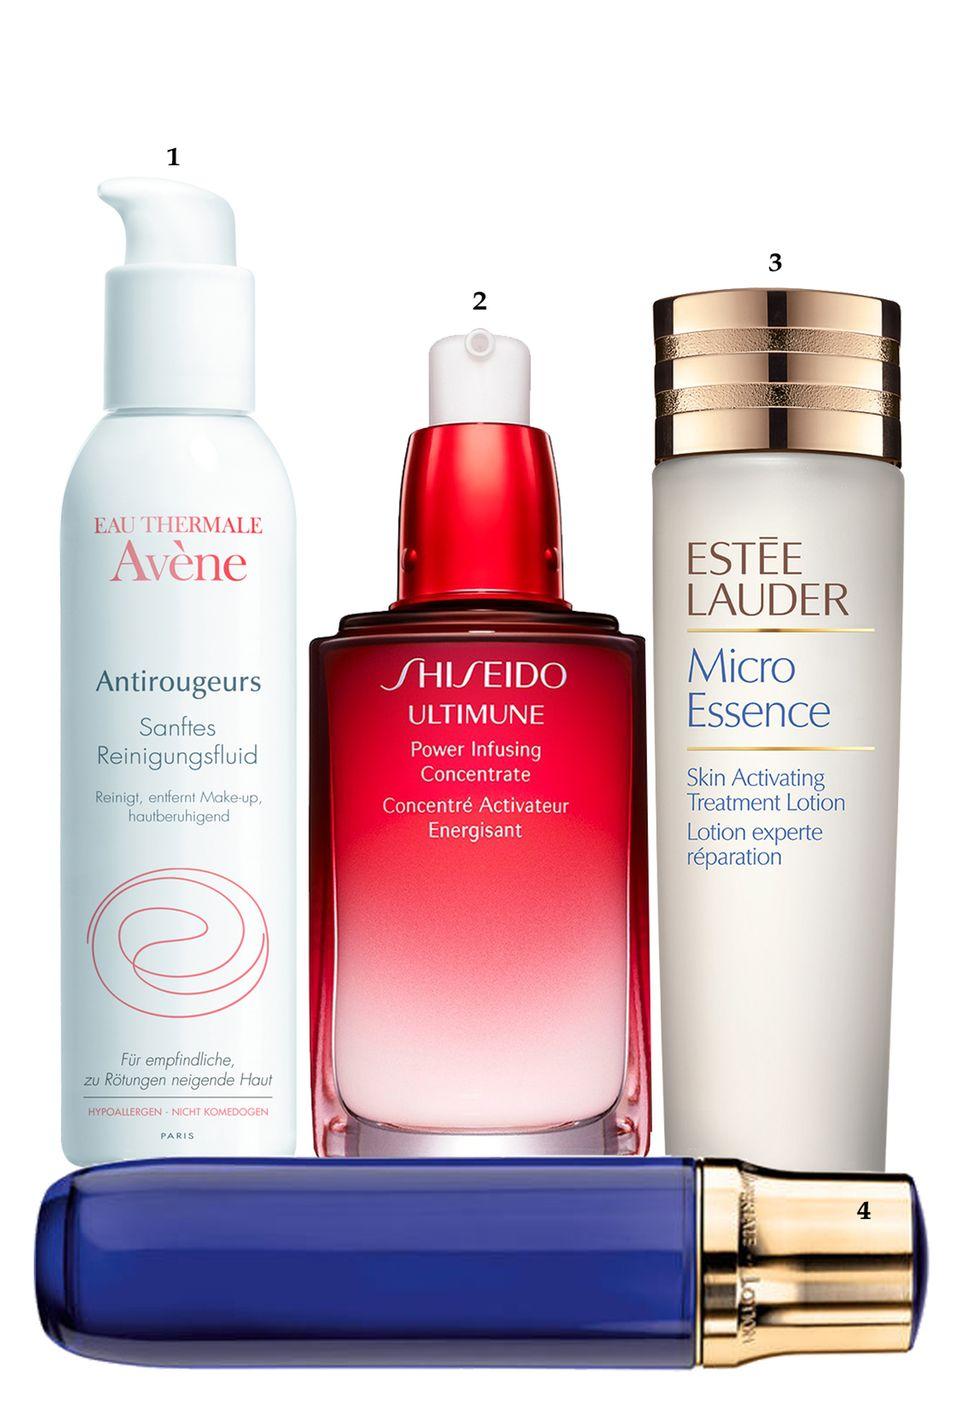 "1. ""Antirougeurs Reinigungsfluid"" von Avène, 300 ml, ca. 20 Euro; 2. ""Ultimune Power Infusing Concentrate"" von Shiseido, 30 ml, ca. 80 Euro; 3. ""Micro Essence Skin Activating Treatment Lotion""  von Estée Lauder, 150 ml, ca. 85 Euro; 4. ""Orchidée Impériale Lotion"" von Guerlain, 125 ml, ca. 110 Euro"